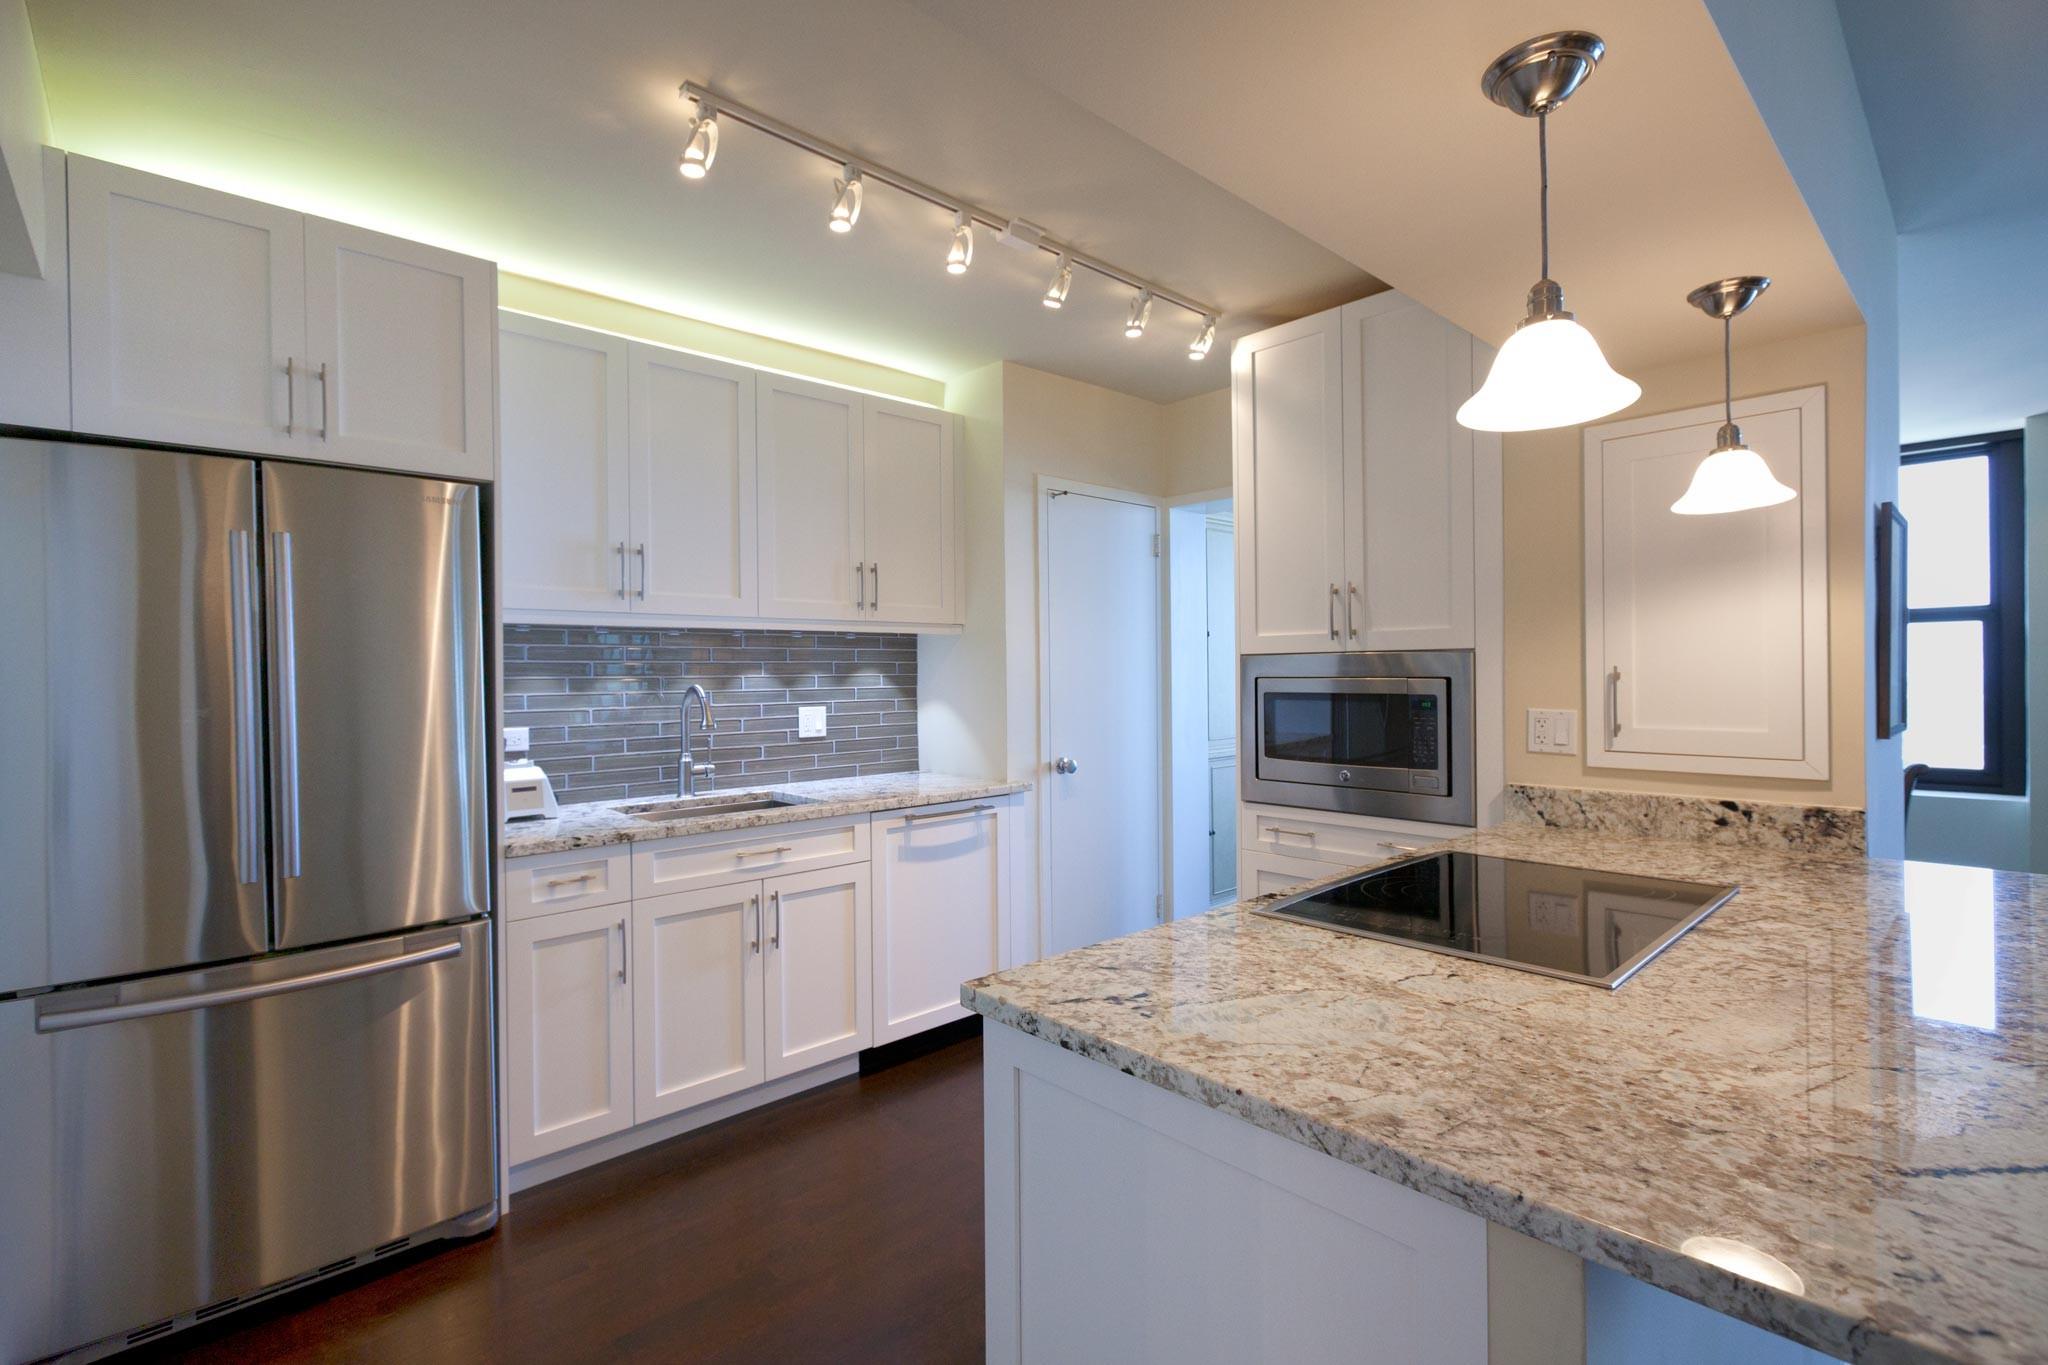 kitchens kitchen remodeling chicago Mr Floor Companies